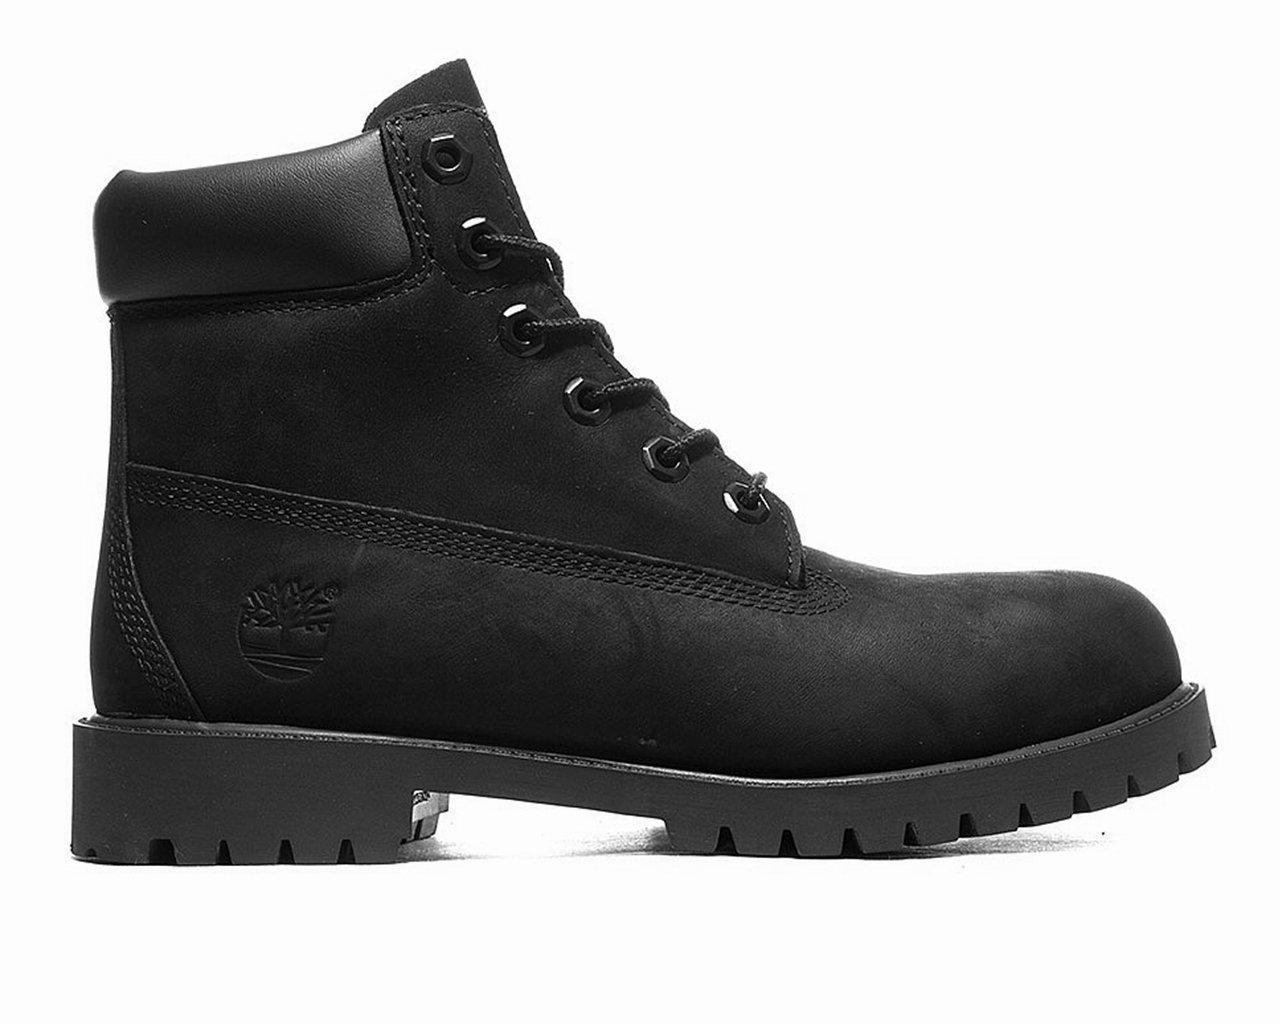 da86919444e Timberland 6 Inch Premium Waterproof Leather Boots Black in Black ...